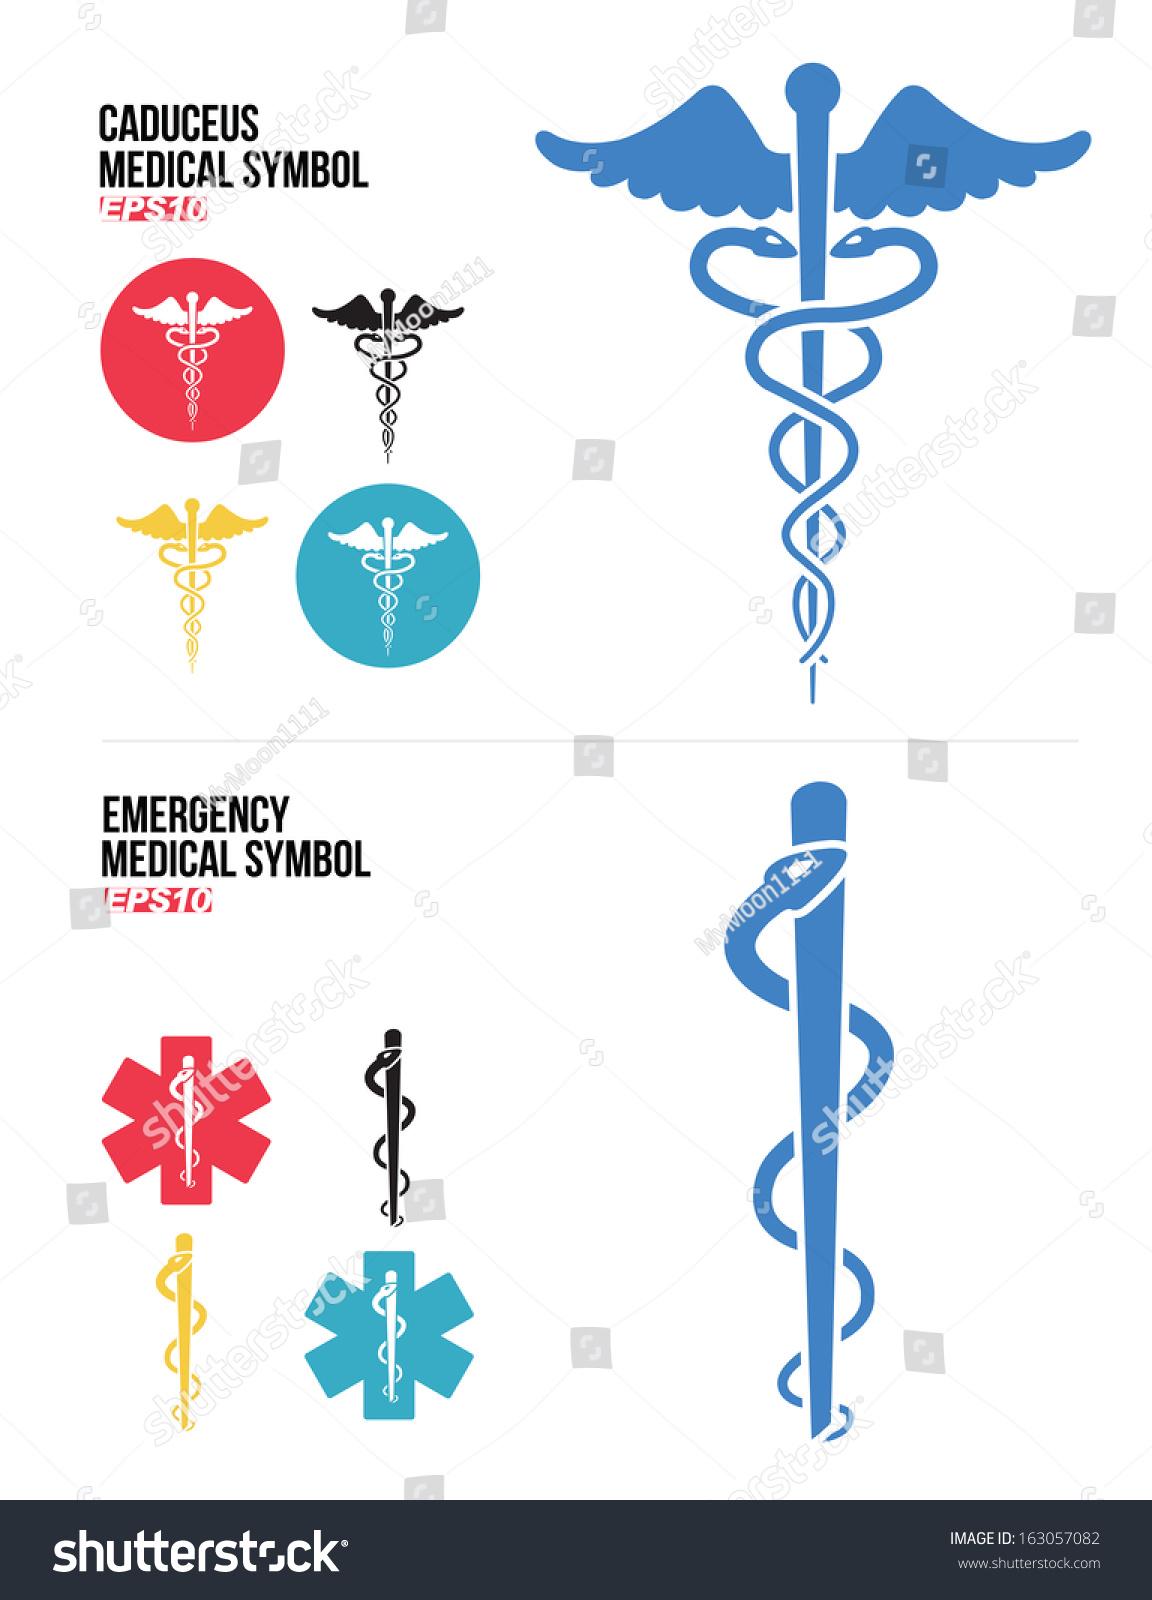 Caduceus Medical Emergency Medical Symbols Icons Stock Vector